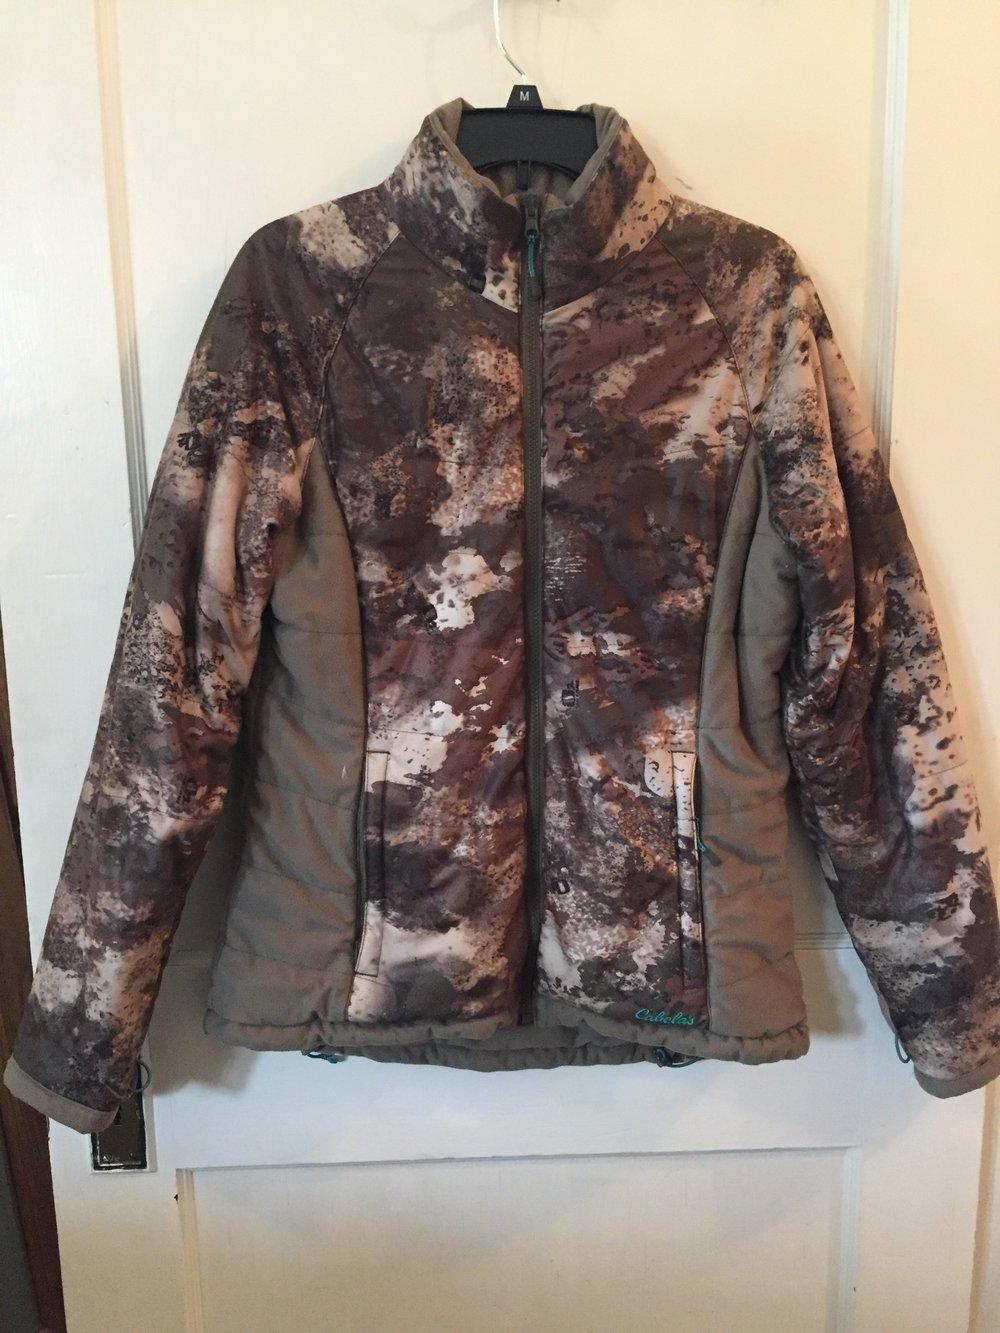 inner-jacket-camo.JPG